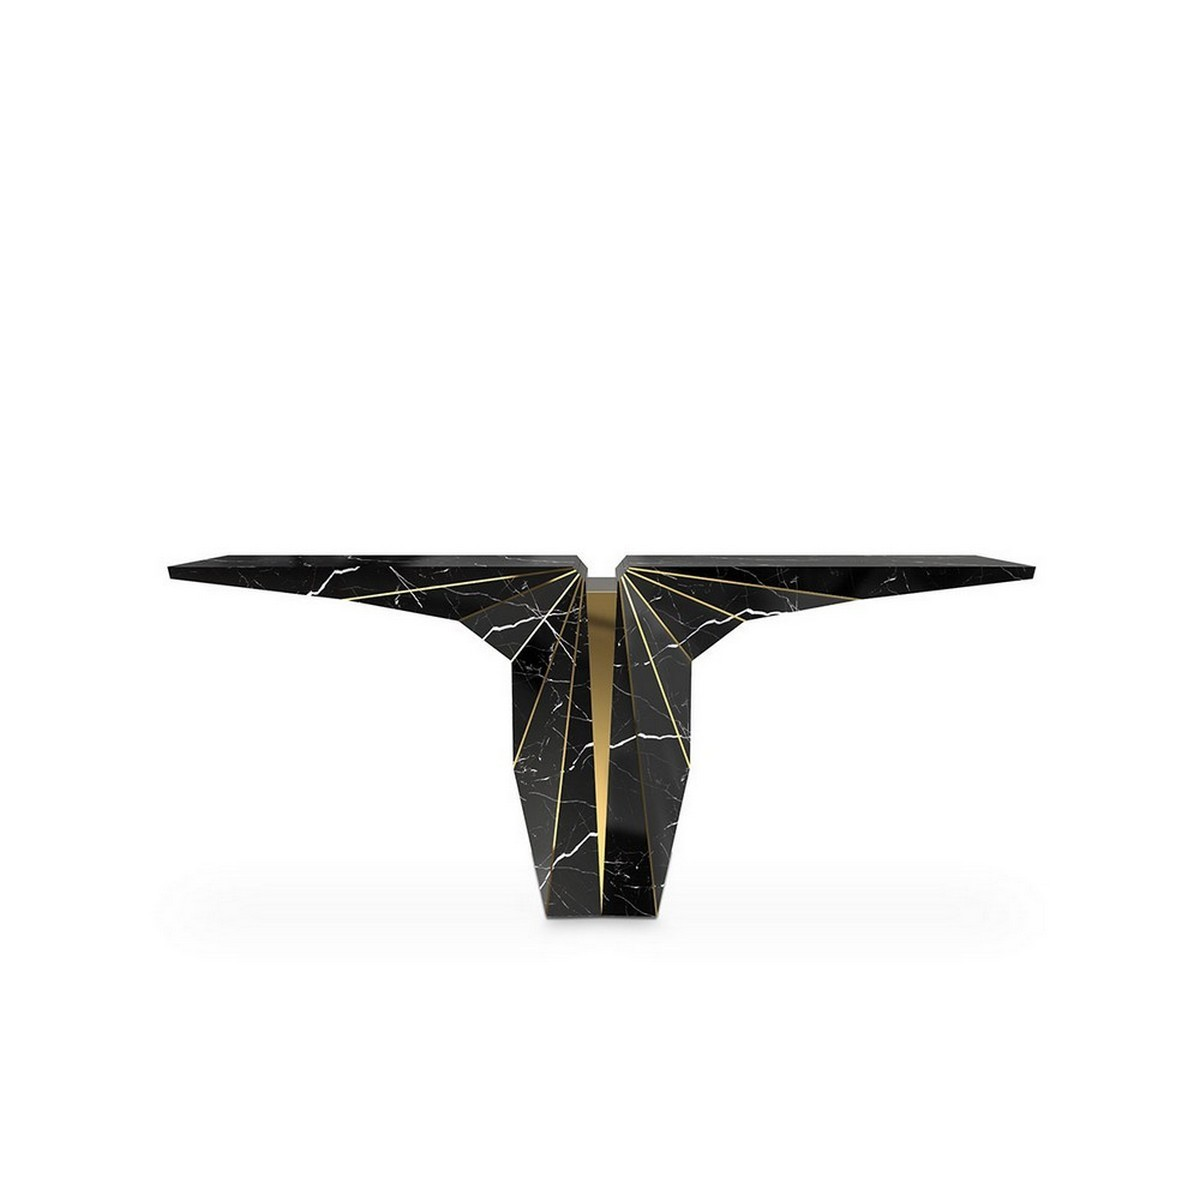 Consolas lujuosas: 10 piezas poderosas para un proyecto elegante consolas lujuosas Consolas lujuosas: 7 piezas poderosas para un proyecto elegante suspicion